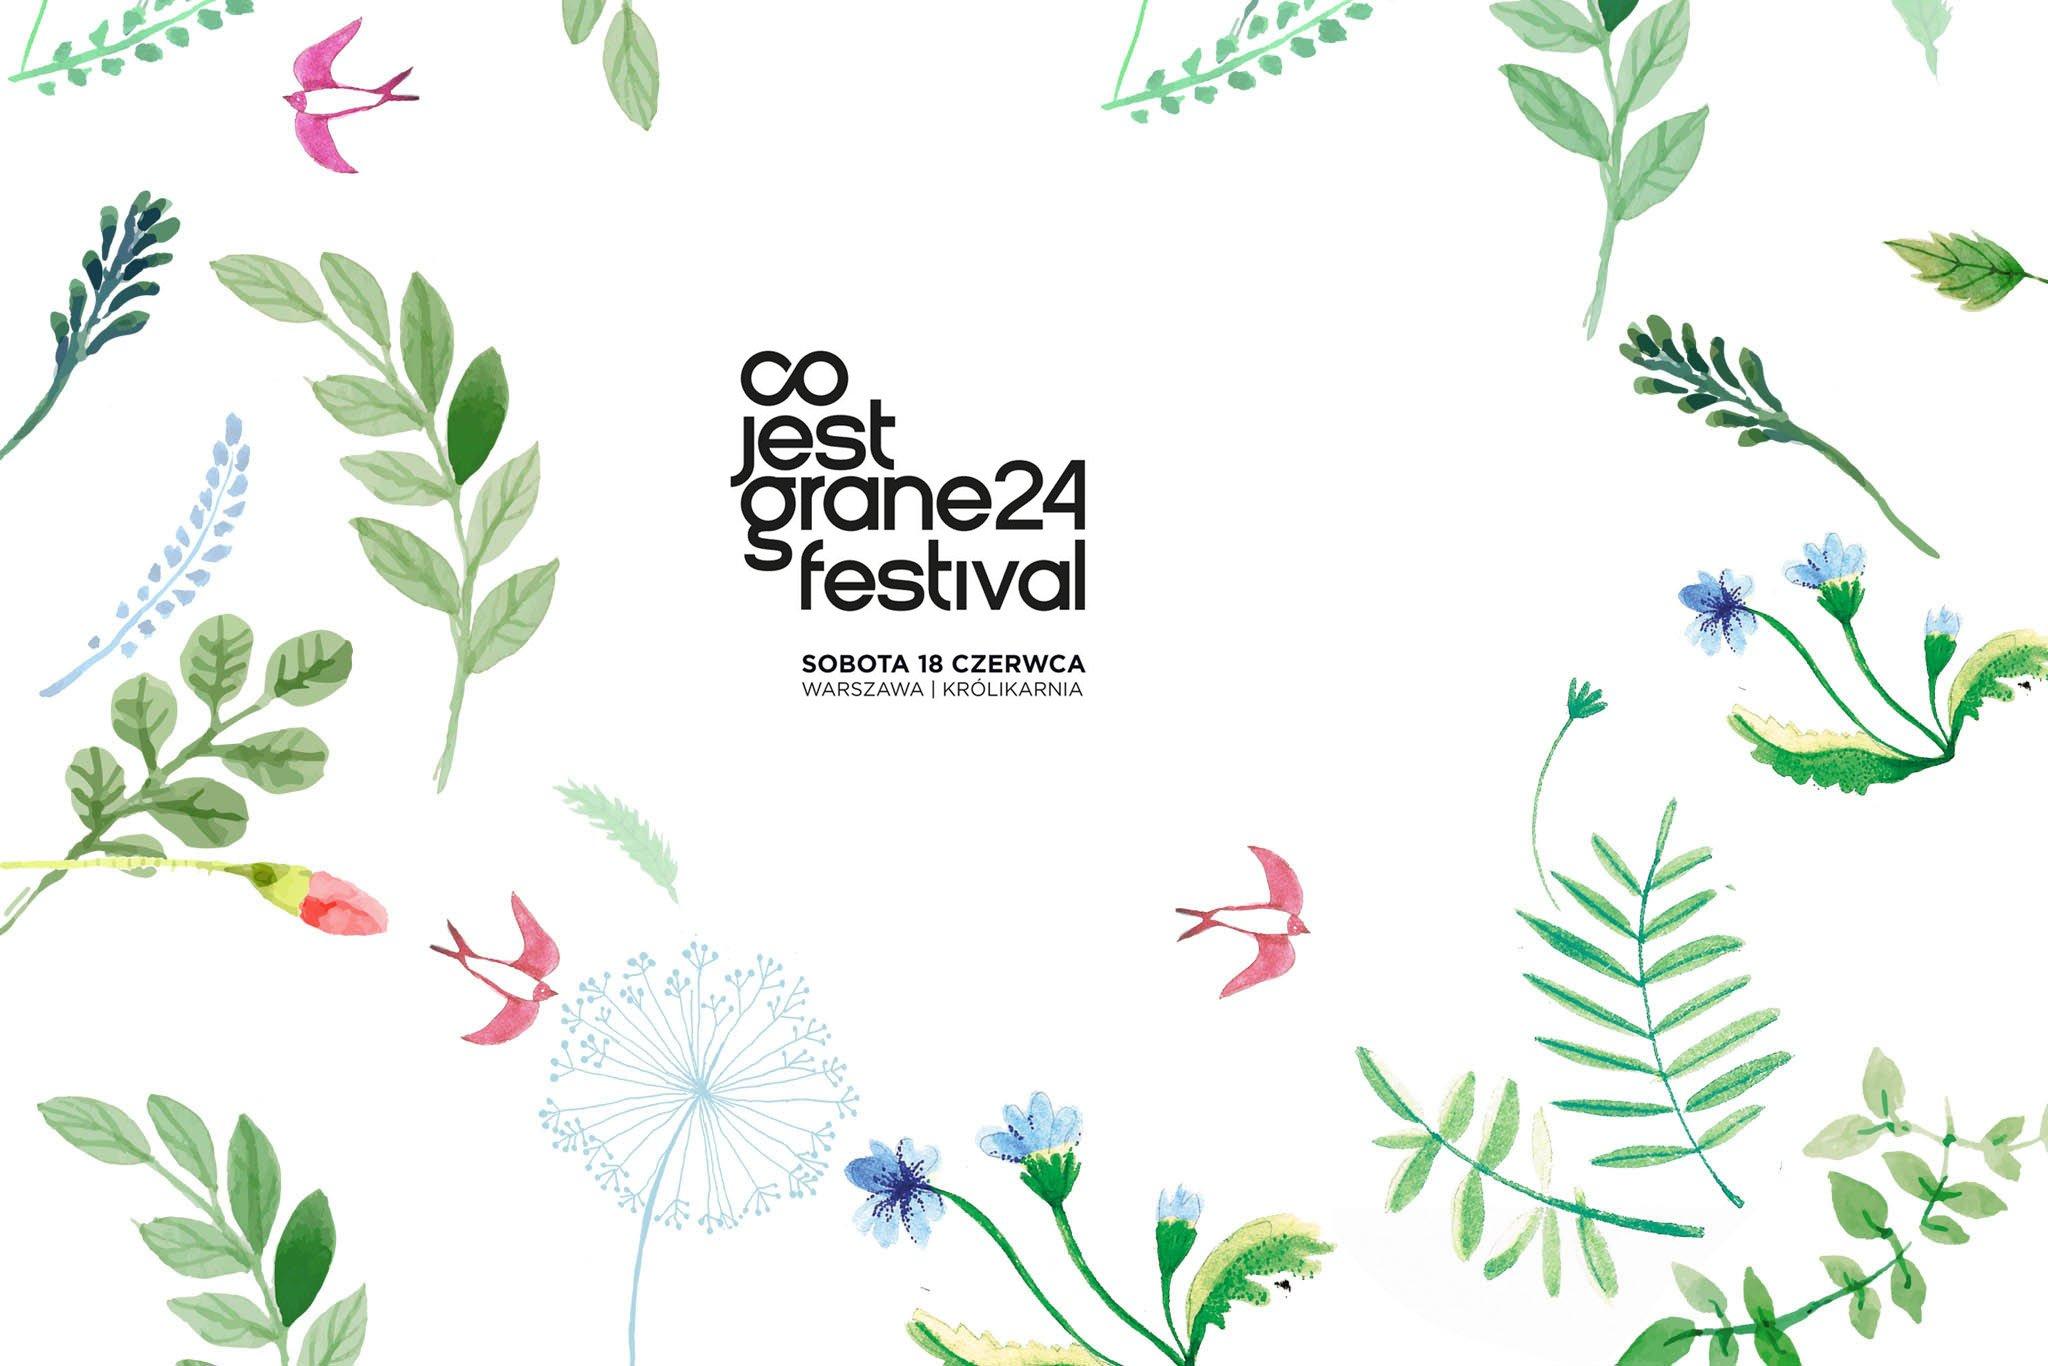 Olsztyn Green Festiwal 2016